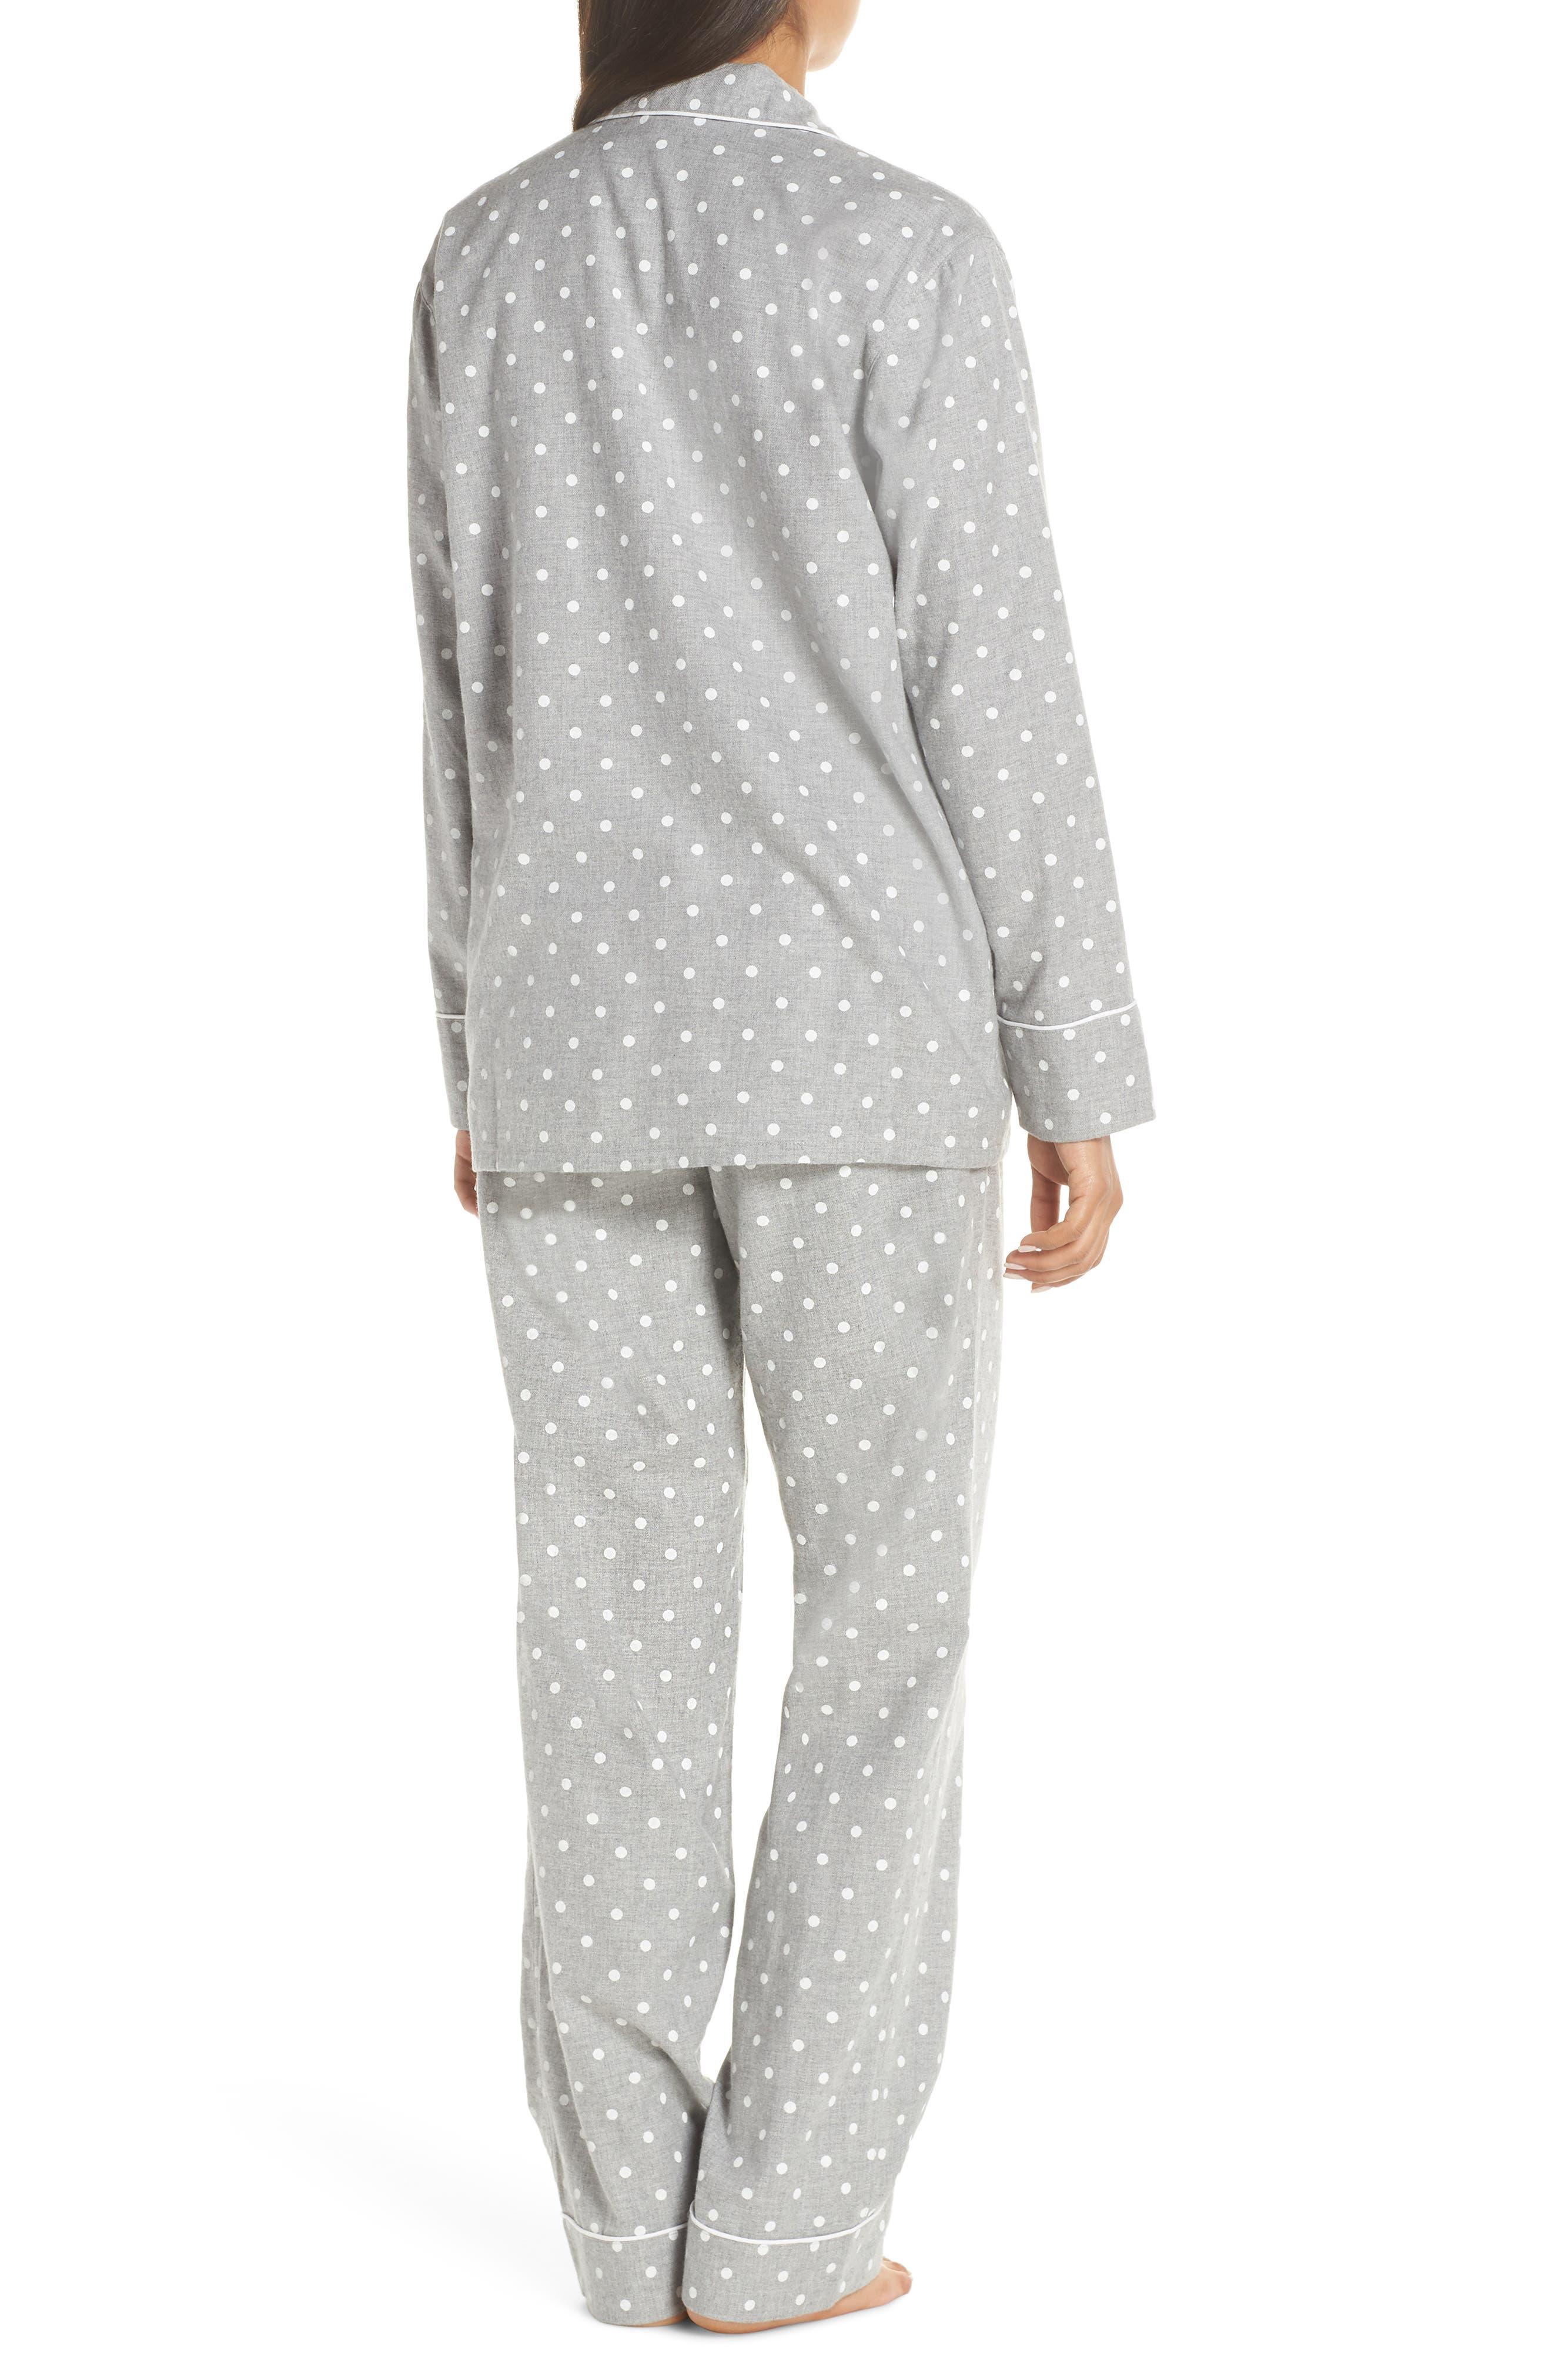 Flannel Pajamas,                             Alternate thumbnail 2, color,                             023